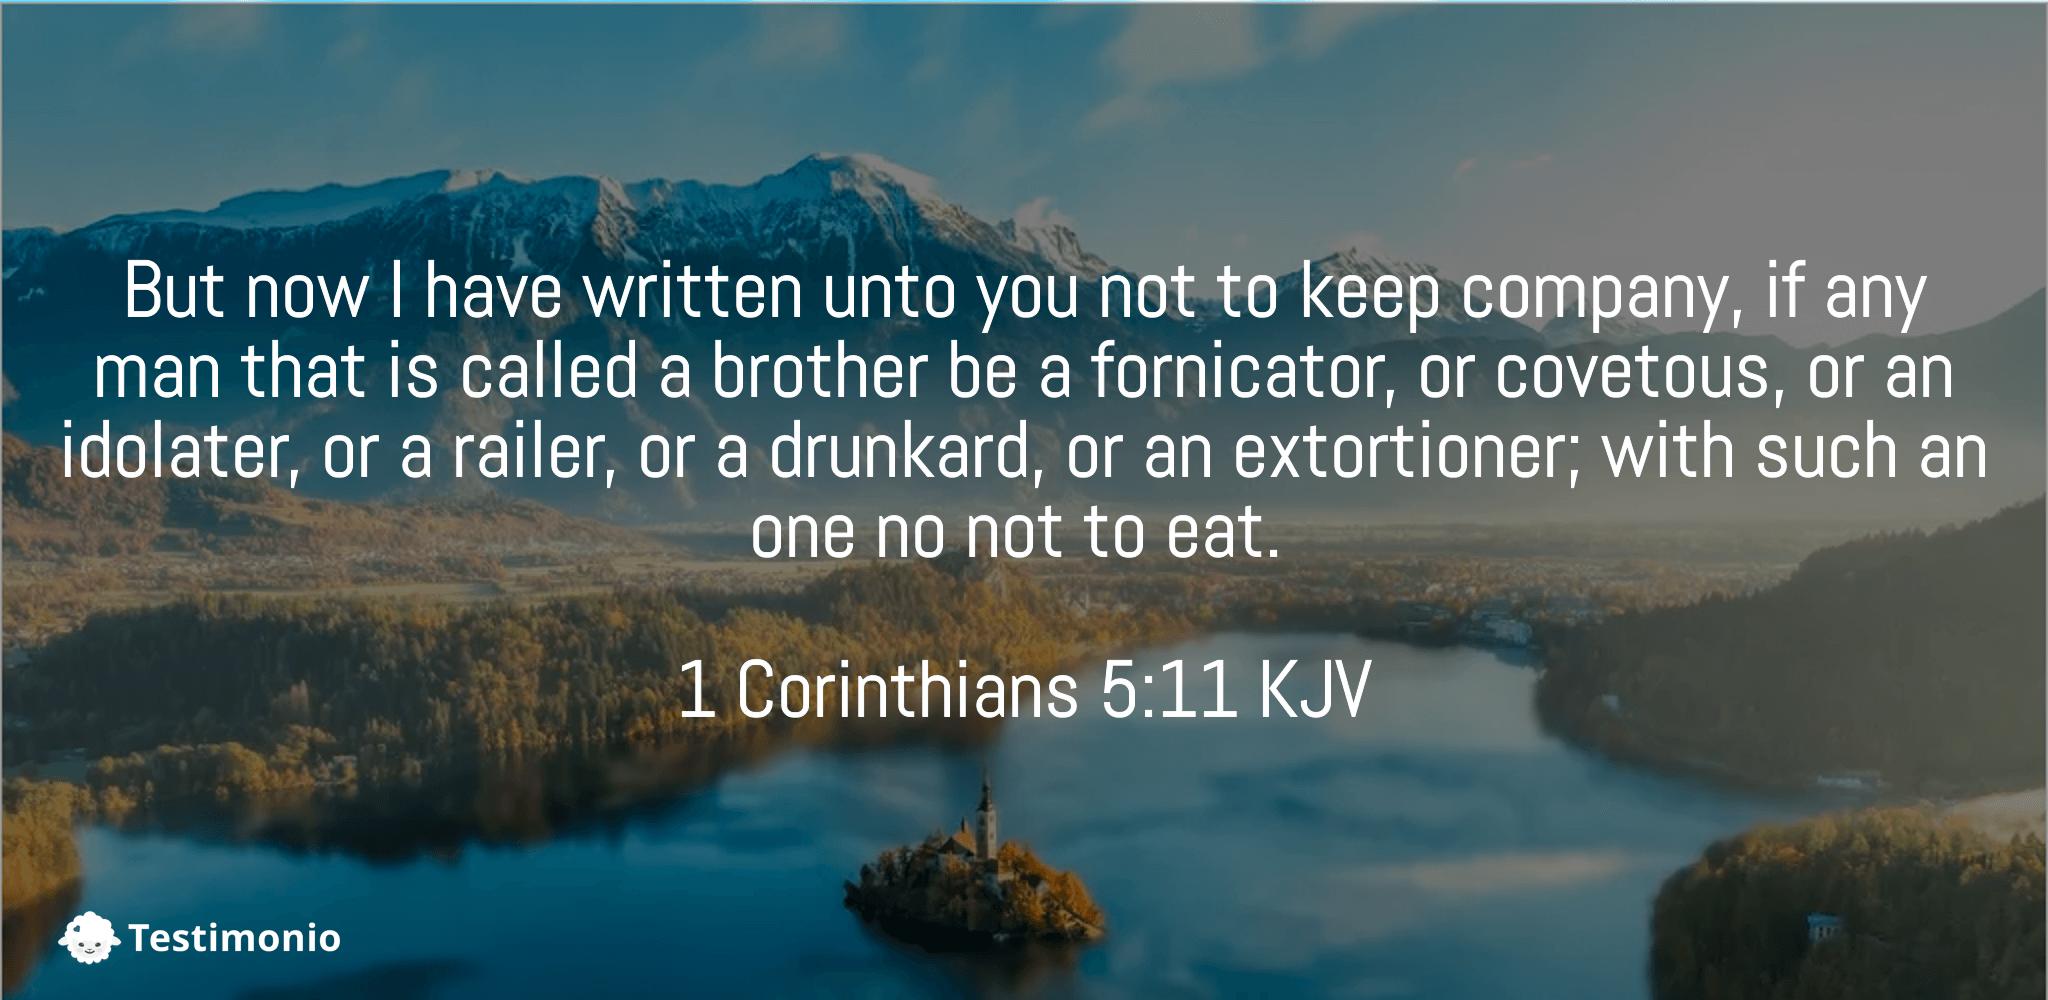 1 Corinthians 5:11